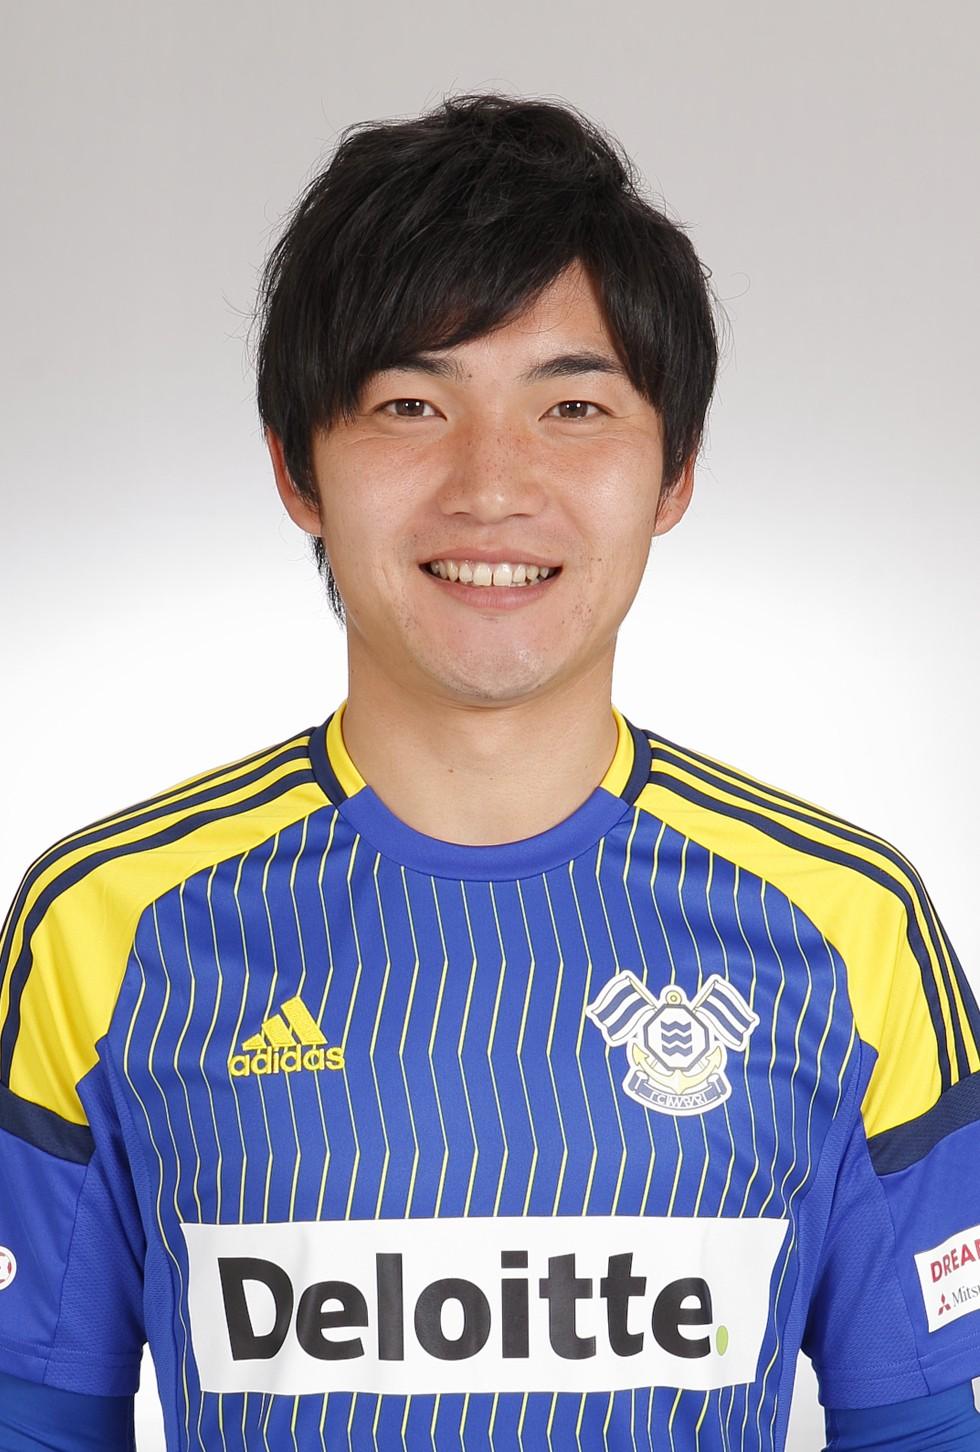 S_8_Misaki_Uemura.JPG